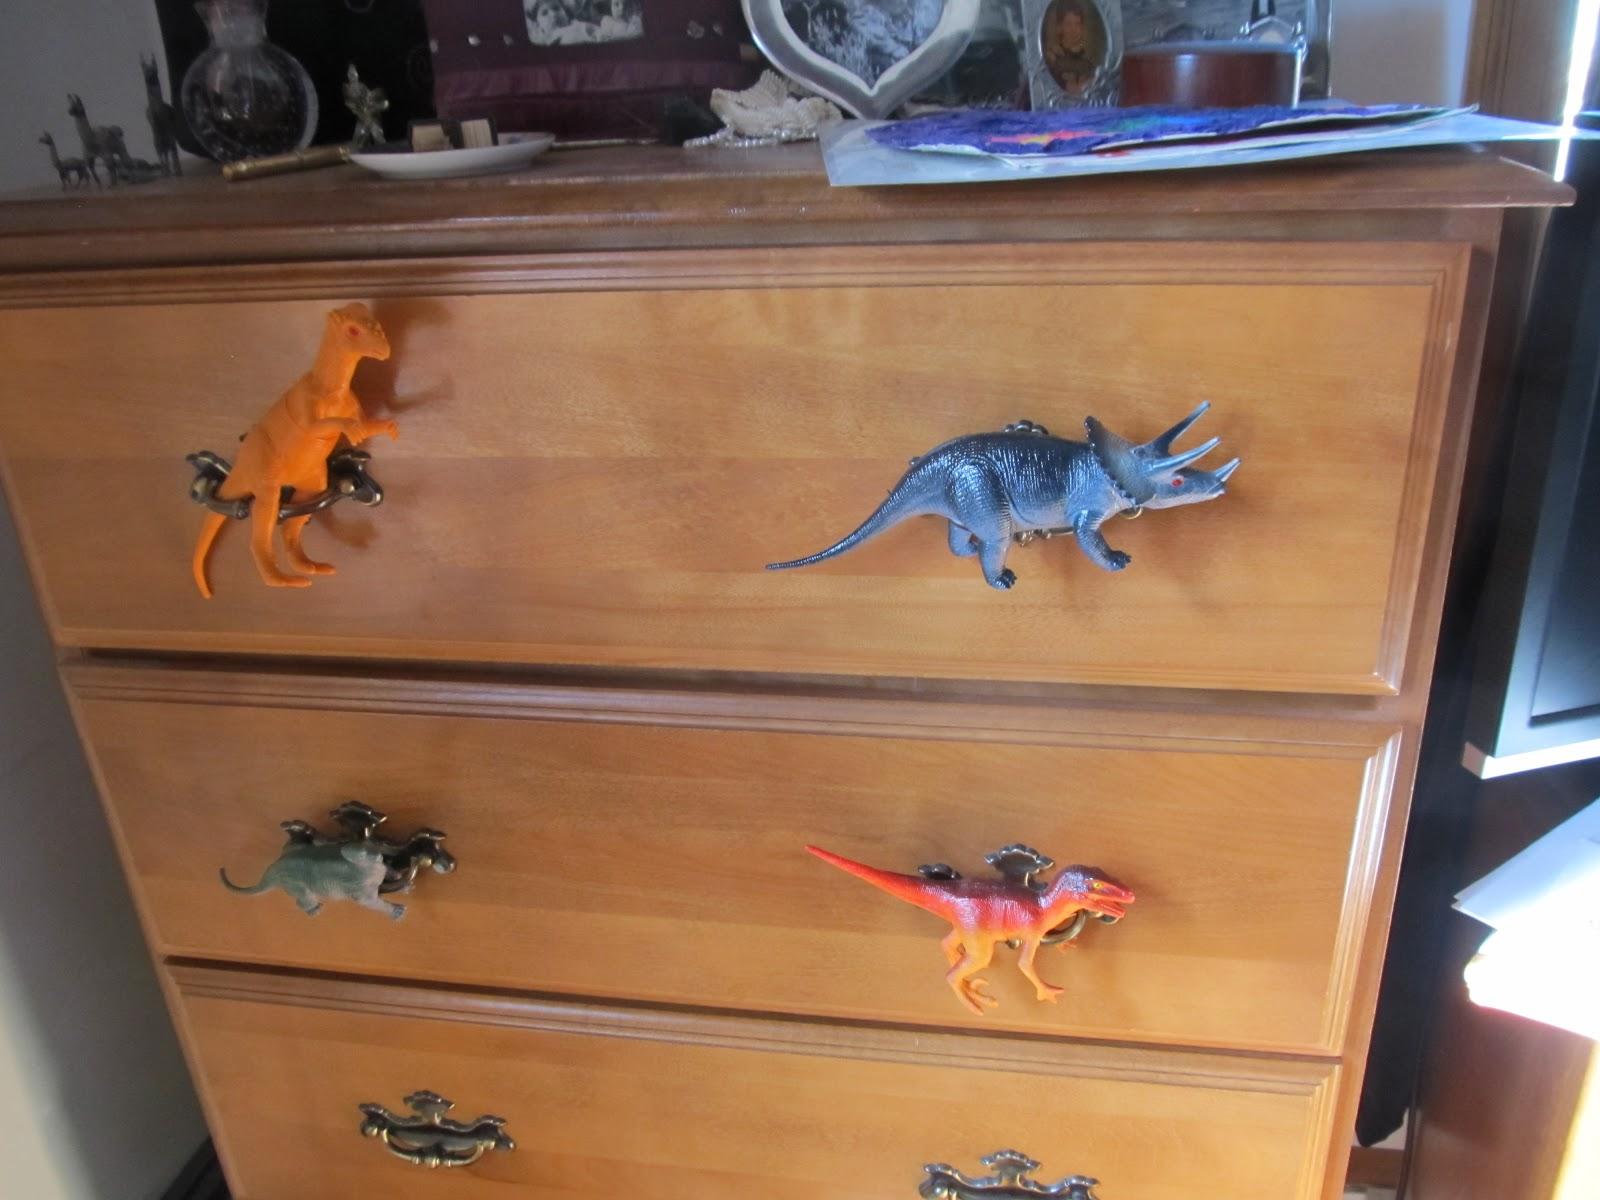 David Scrimshaw S Blog Dinosaur Drawer Pulls